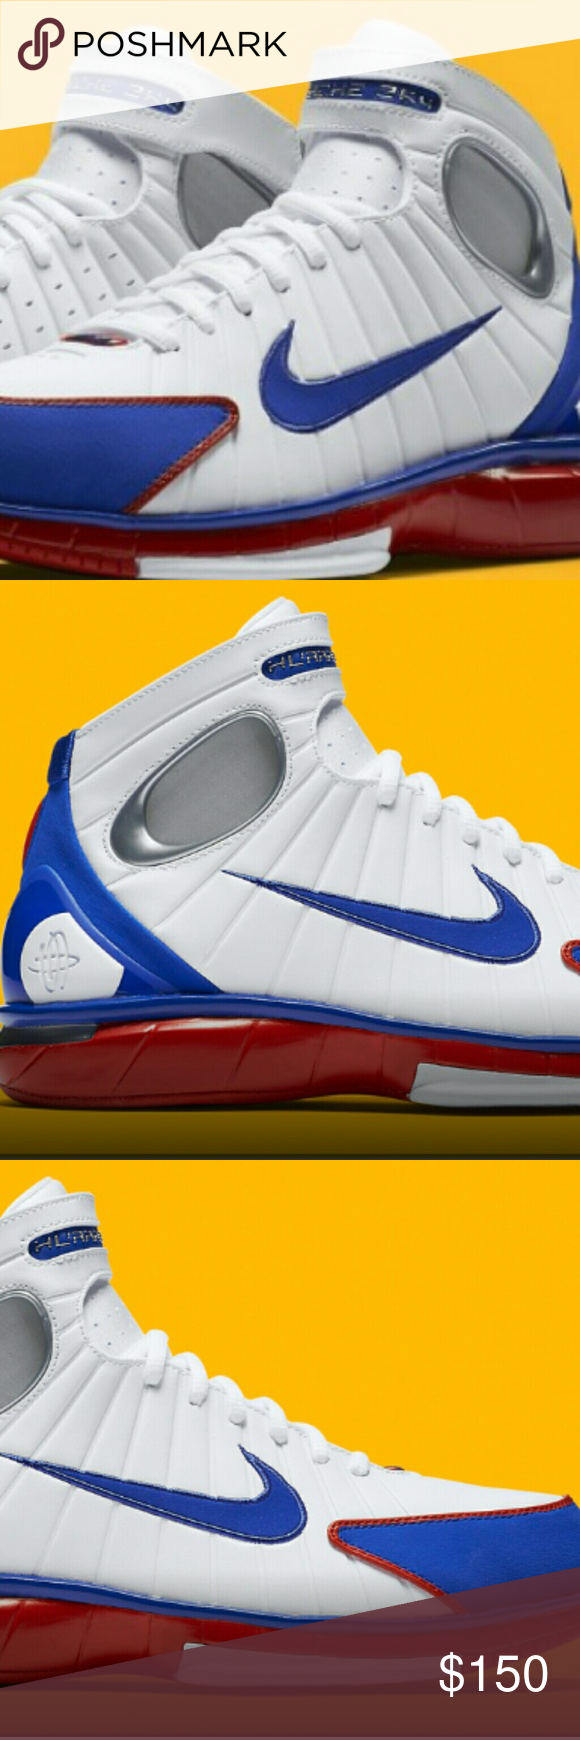 48e2edb51876 Nike Kobe Retro Air Zoom Huarache 2K4(All Star) 🔥🔥Man this shoe is ...